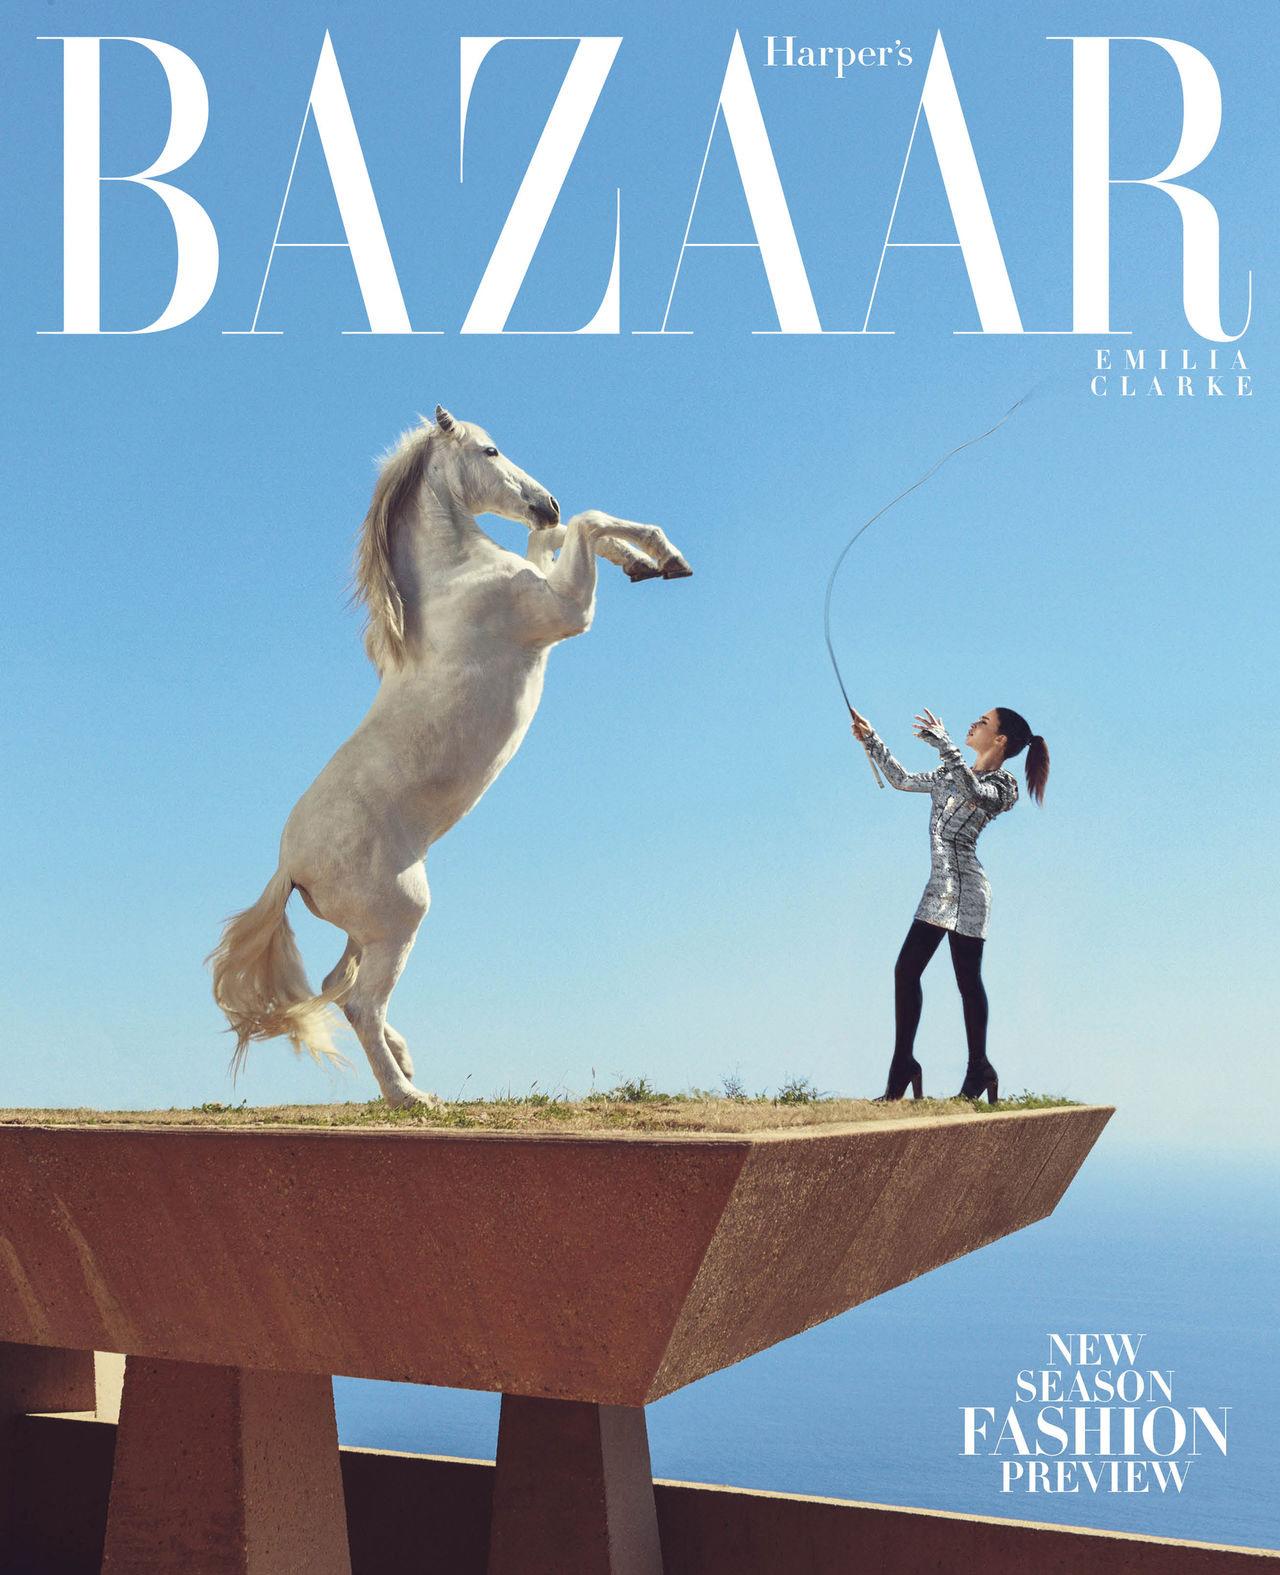 La majestuosa Emilia Clarke en Harper's Bazaar junio/julio 2015